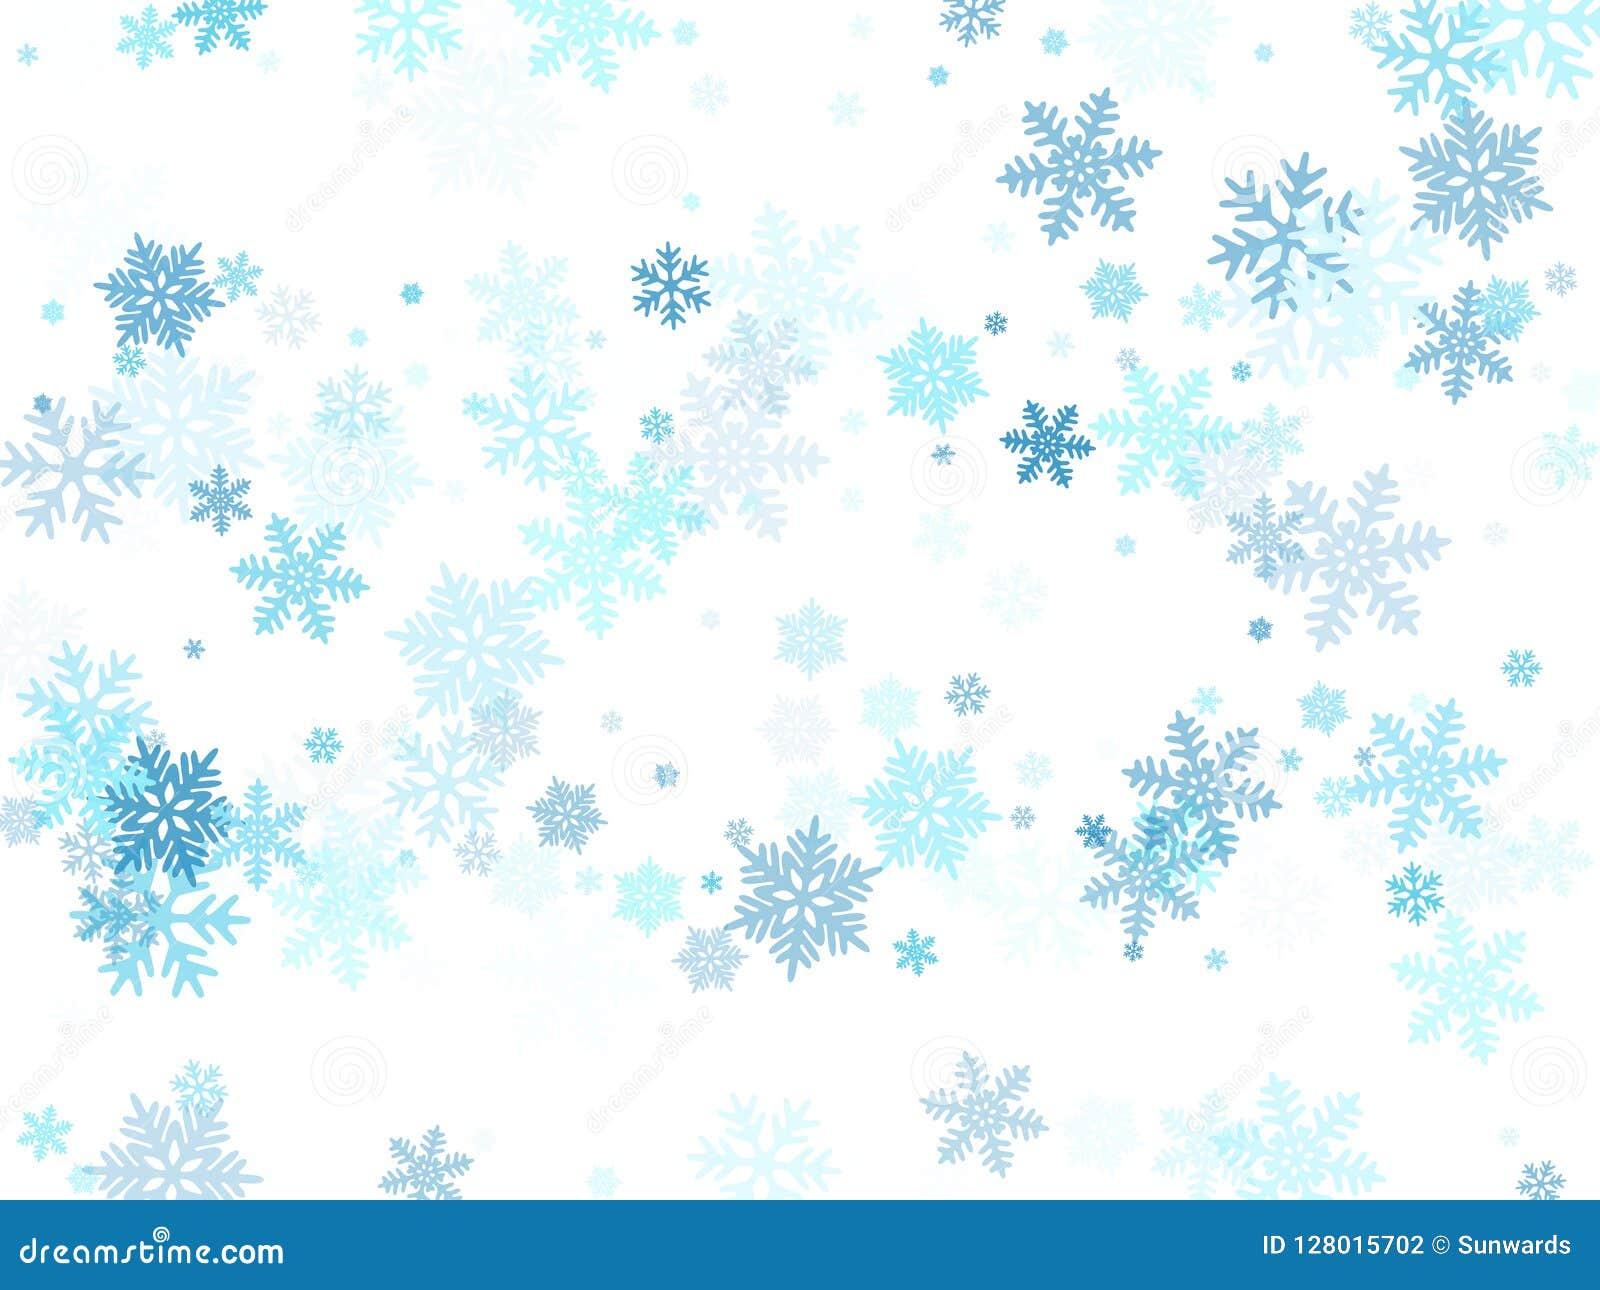 Christmas Snowflakes.Snow Flakes Falling Macro Vector Graphics Christmas